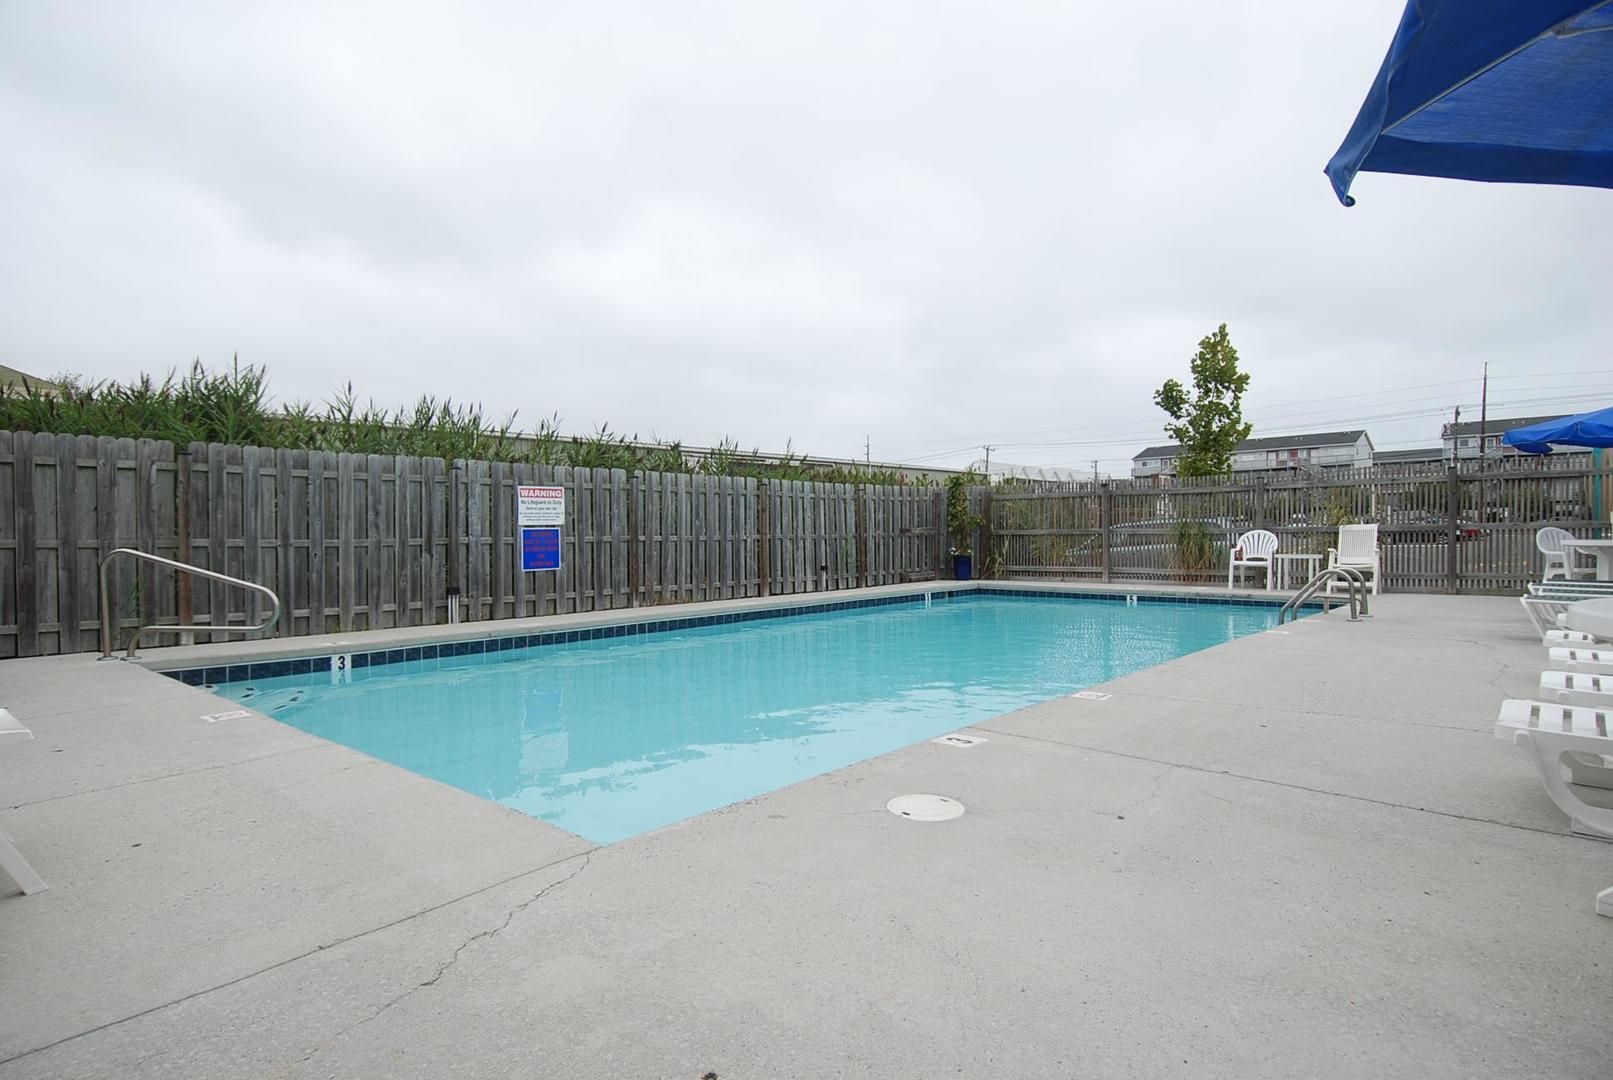 Maresol Outdoor Pool (open seasonally)